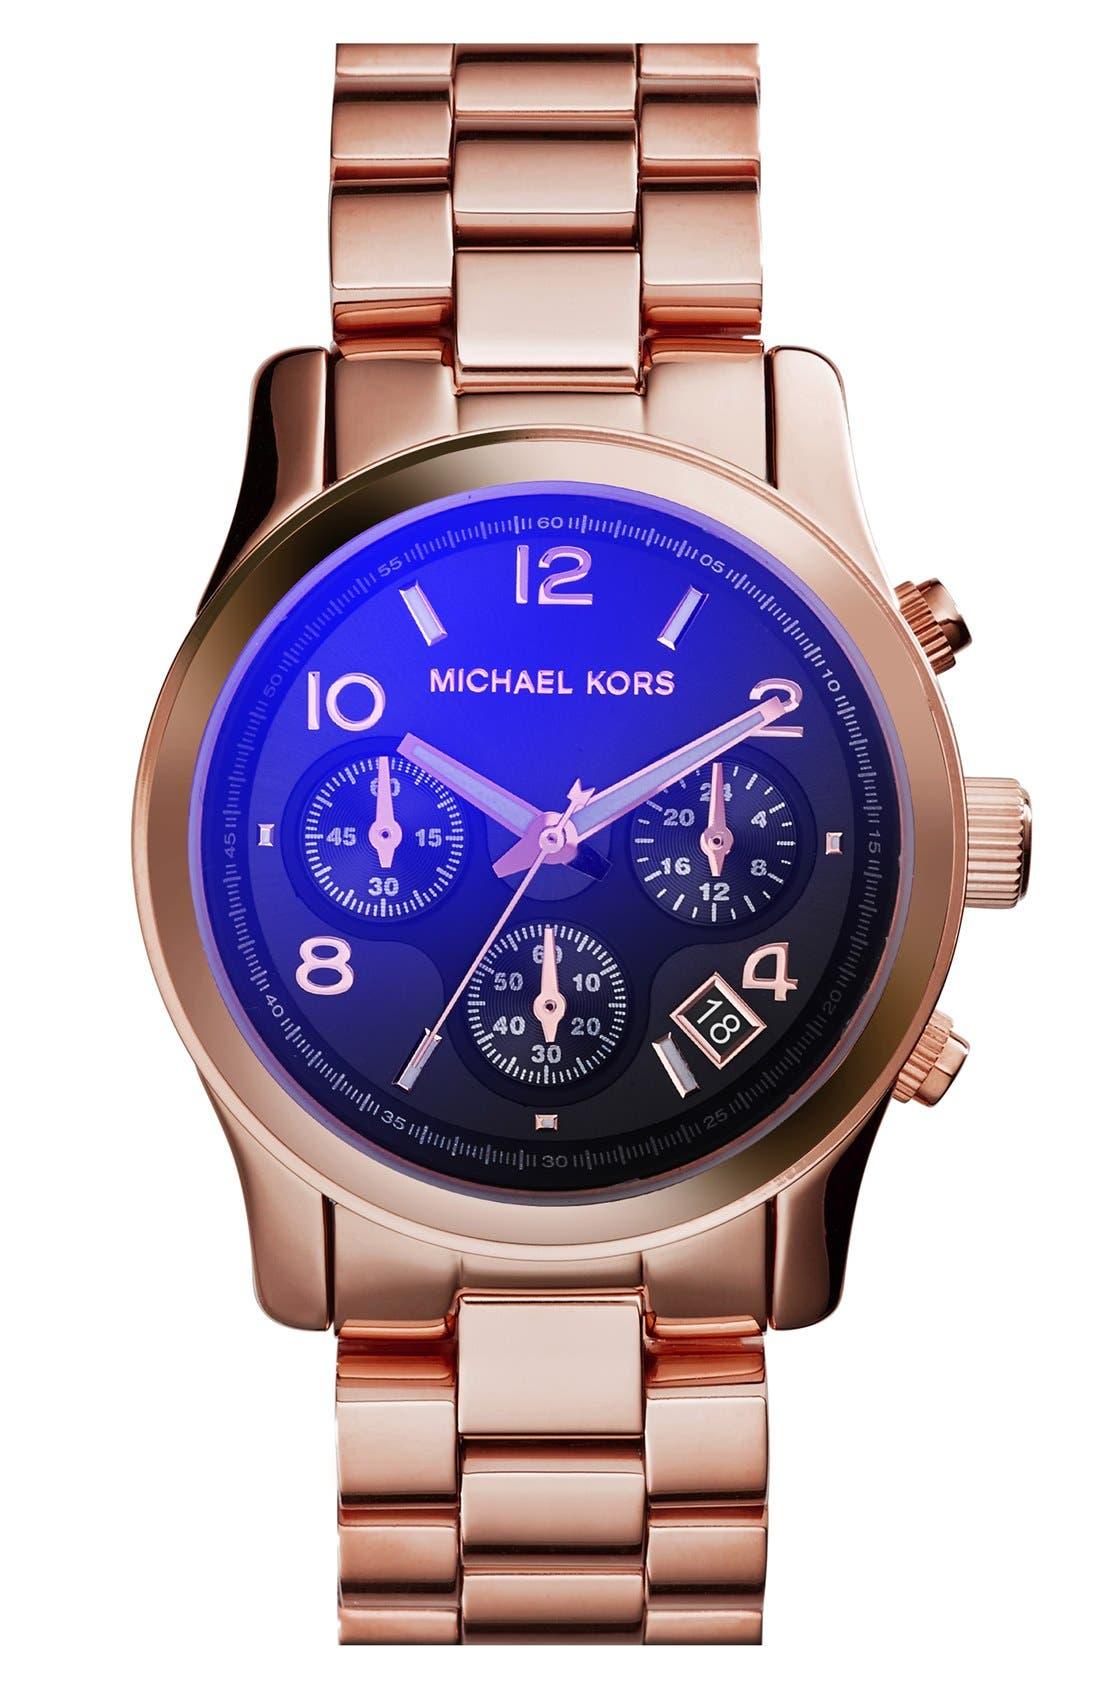 Alternate Image 1 Selected - Michael Kors 'Runway' Rose Gold Plated Watch, 37mm